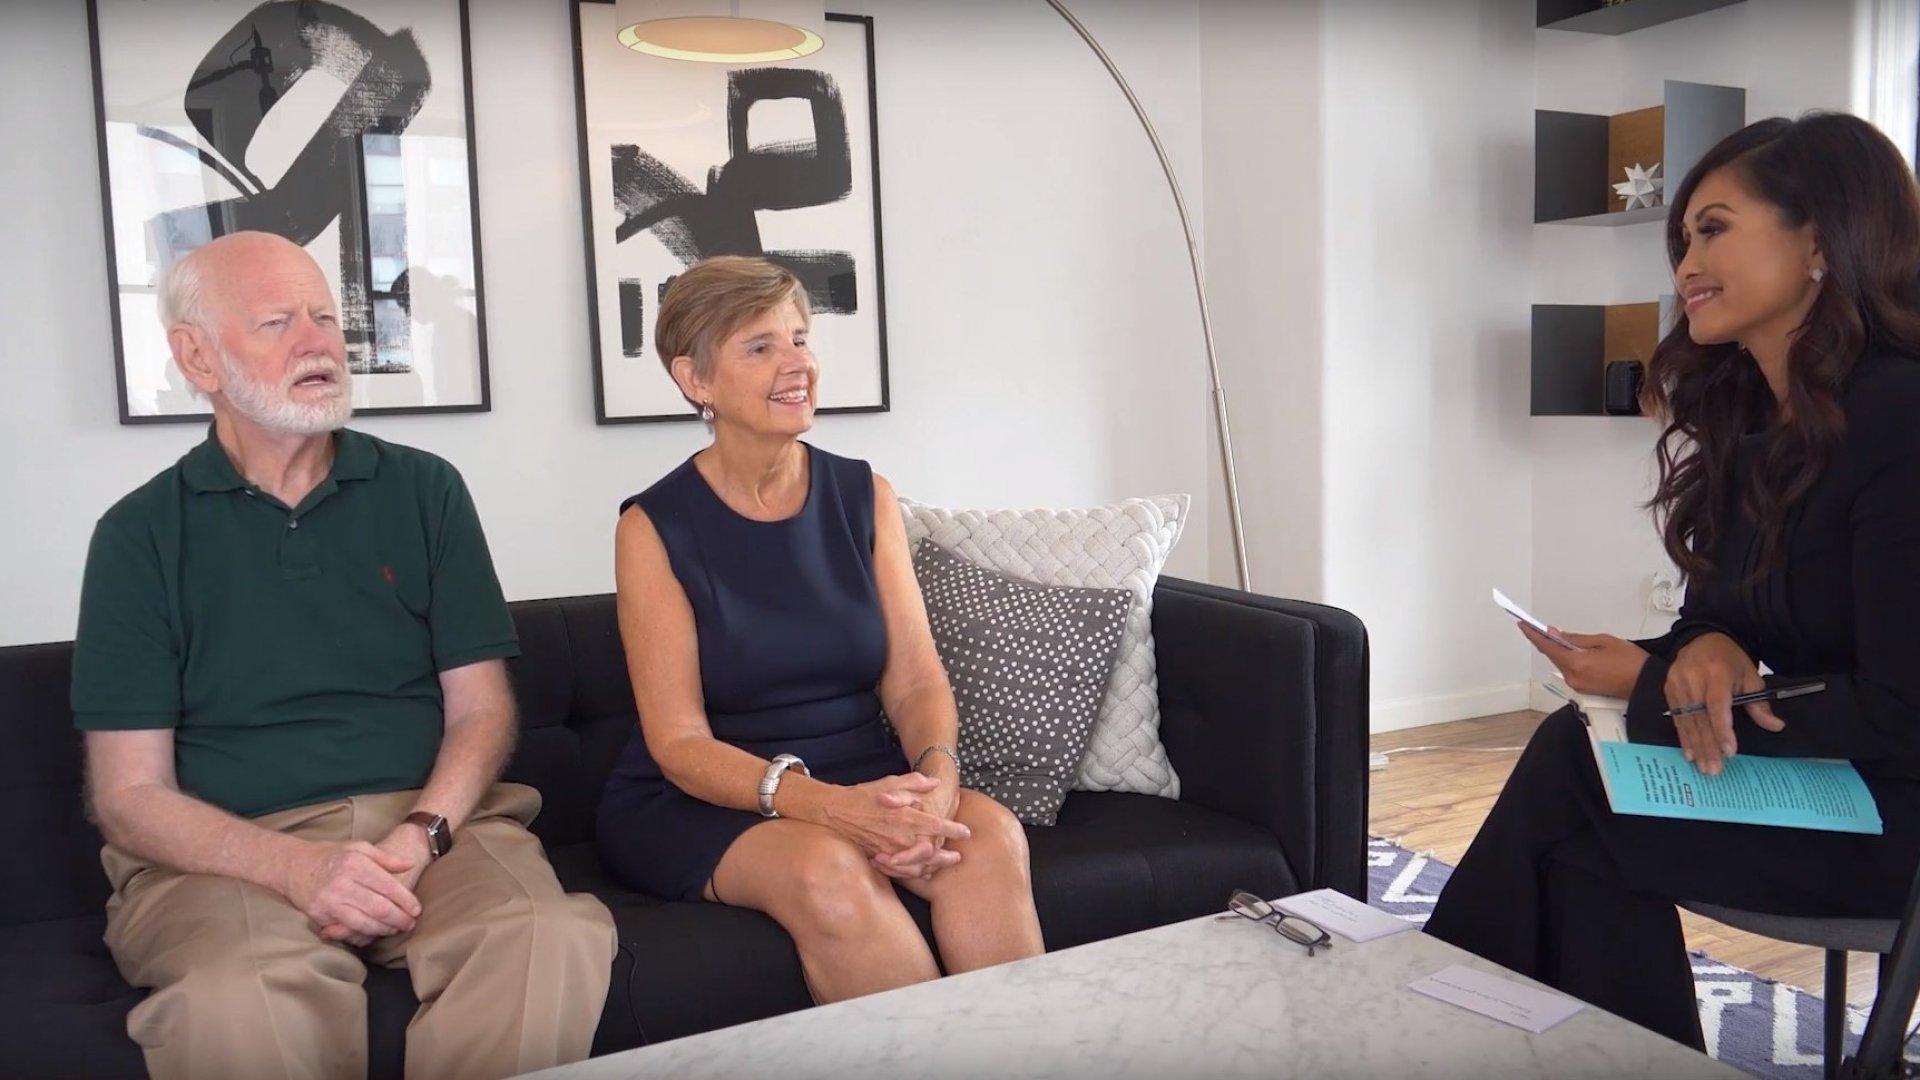 Executive coaches Marshall Goldsmith and Sally Helgesen talk to EO Wonder podcast host Kalika Yap.